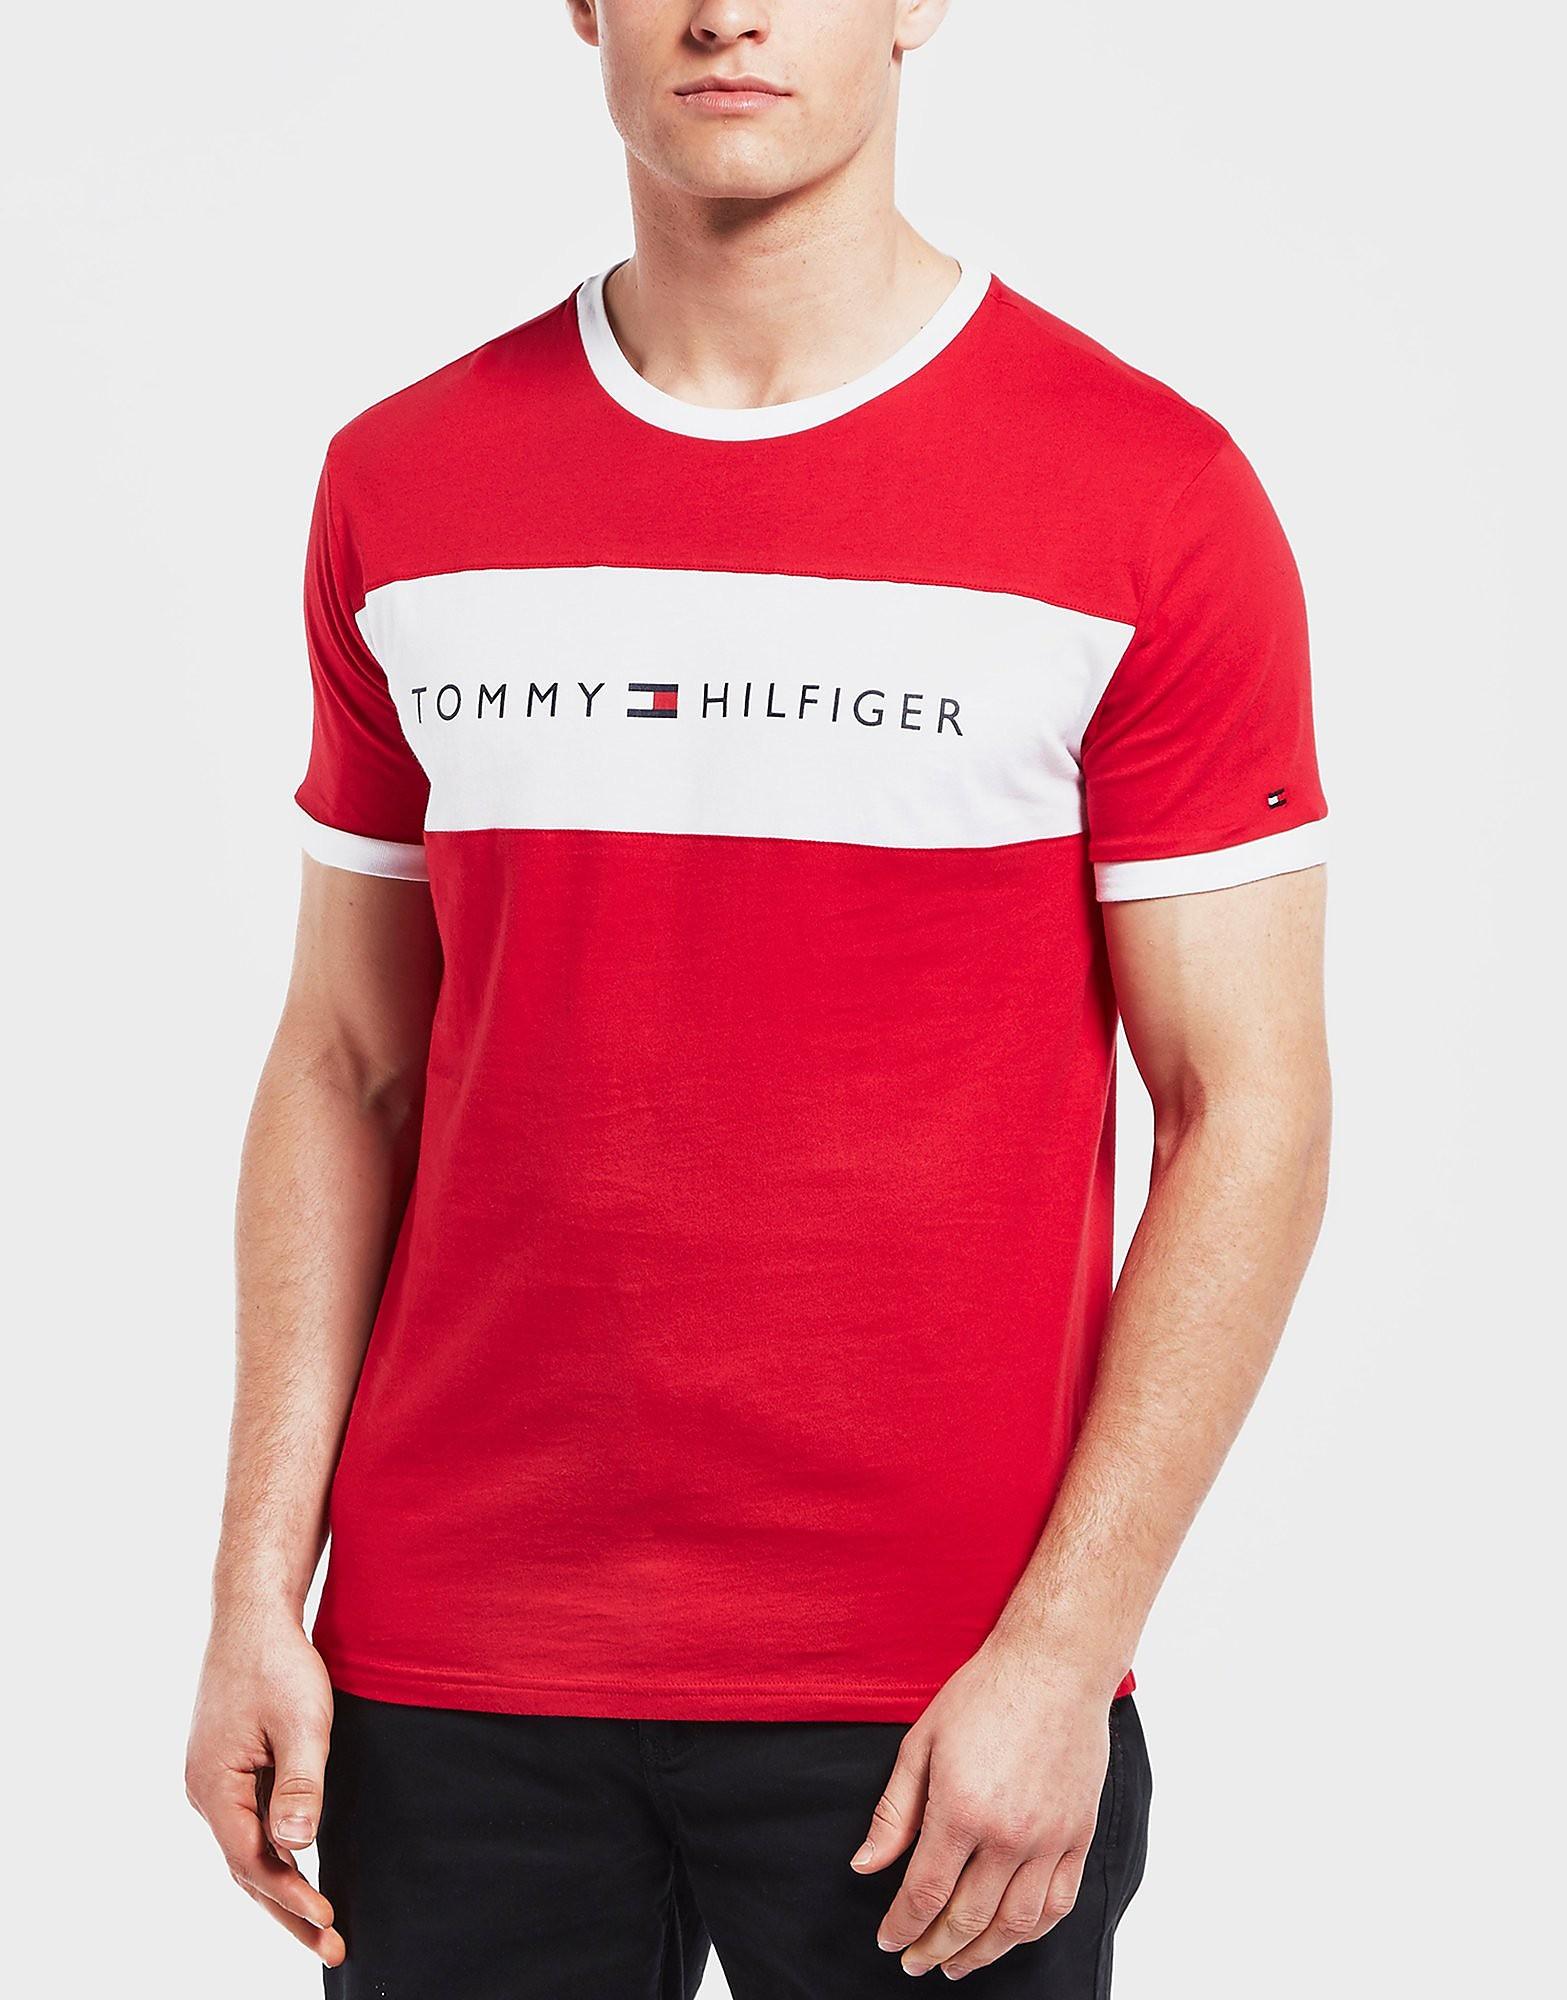 Tommy Hilfiger Colour Block Short Sleeve T-Shirt